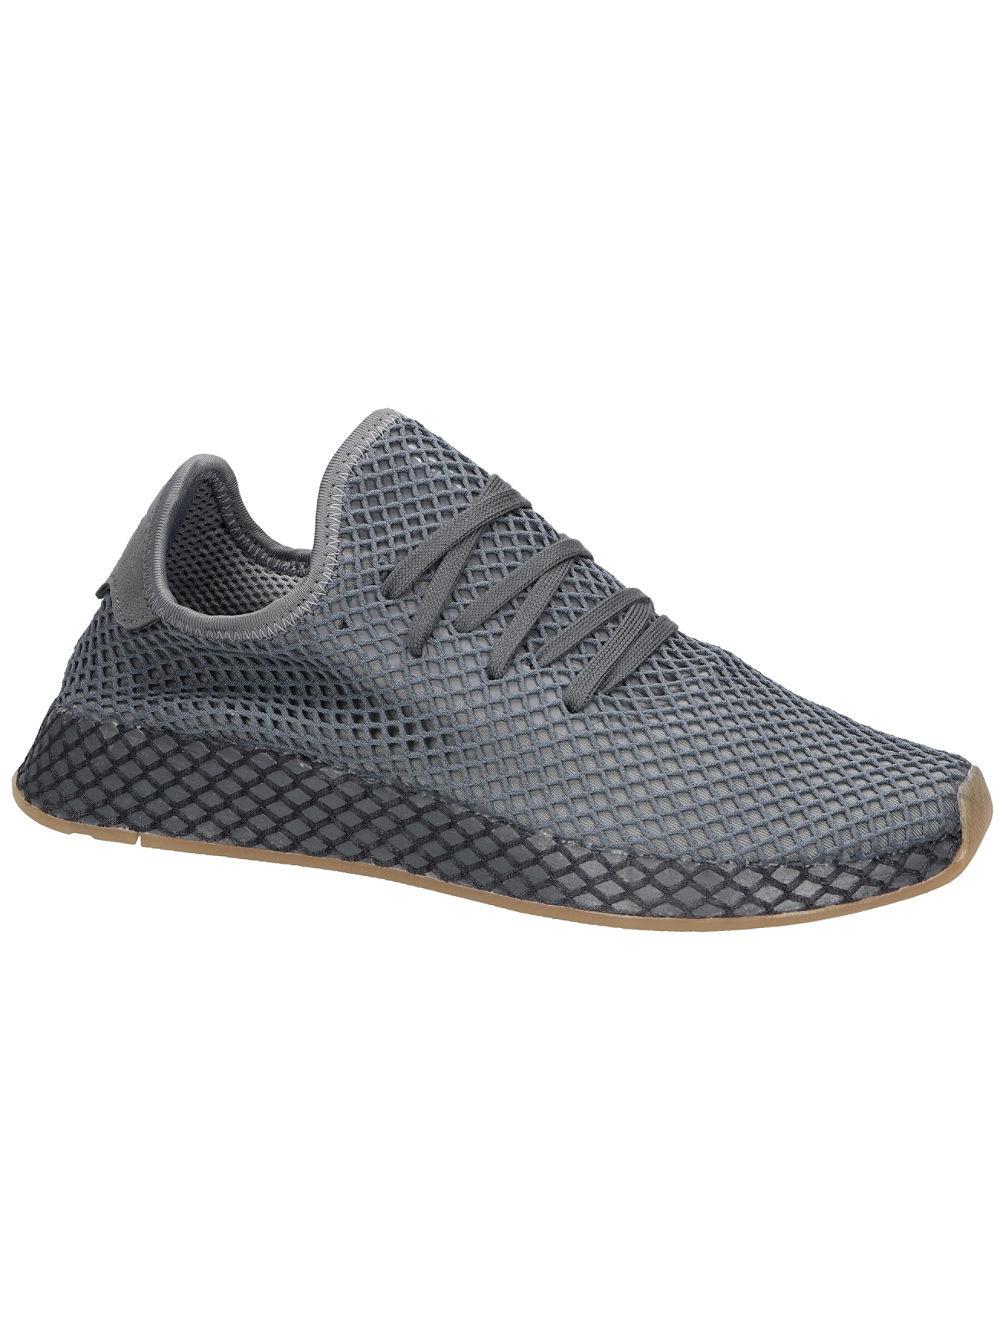 d7720b7393ca40 adidas Originals Deerupt Sneakers online kaufen bei Blue Tomato